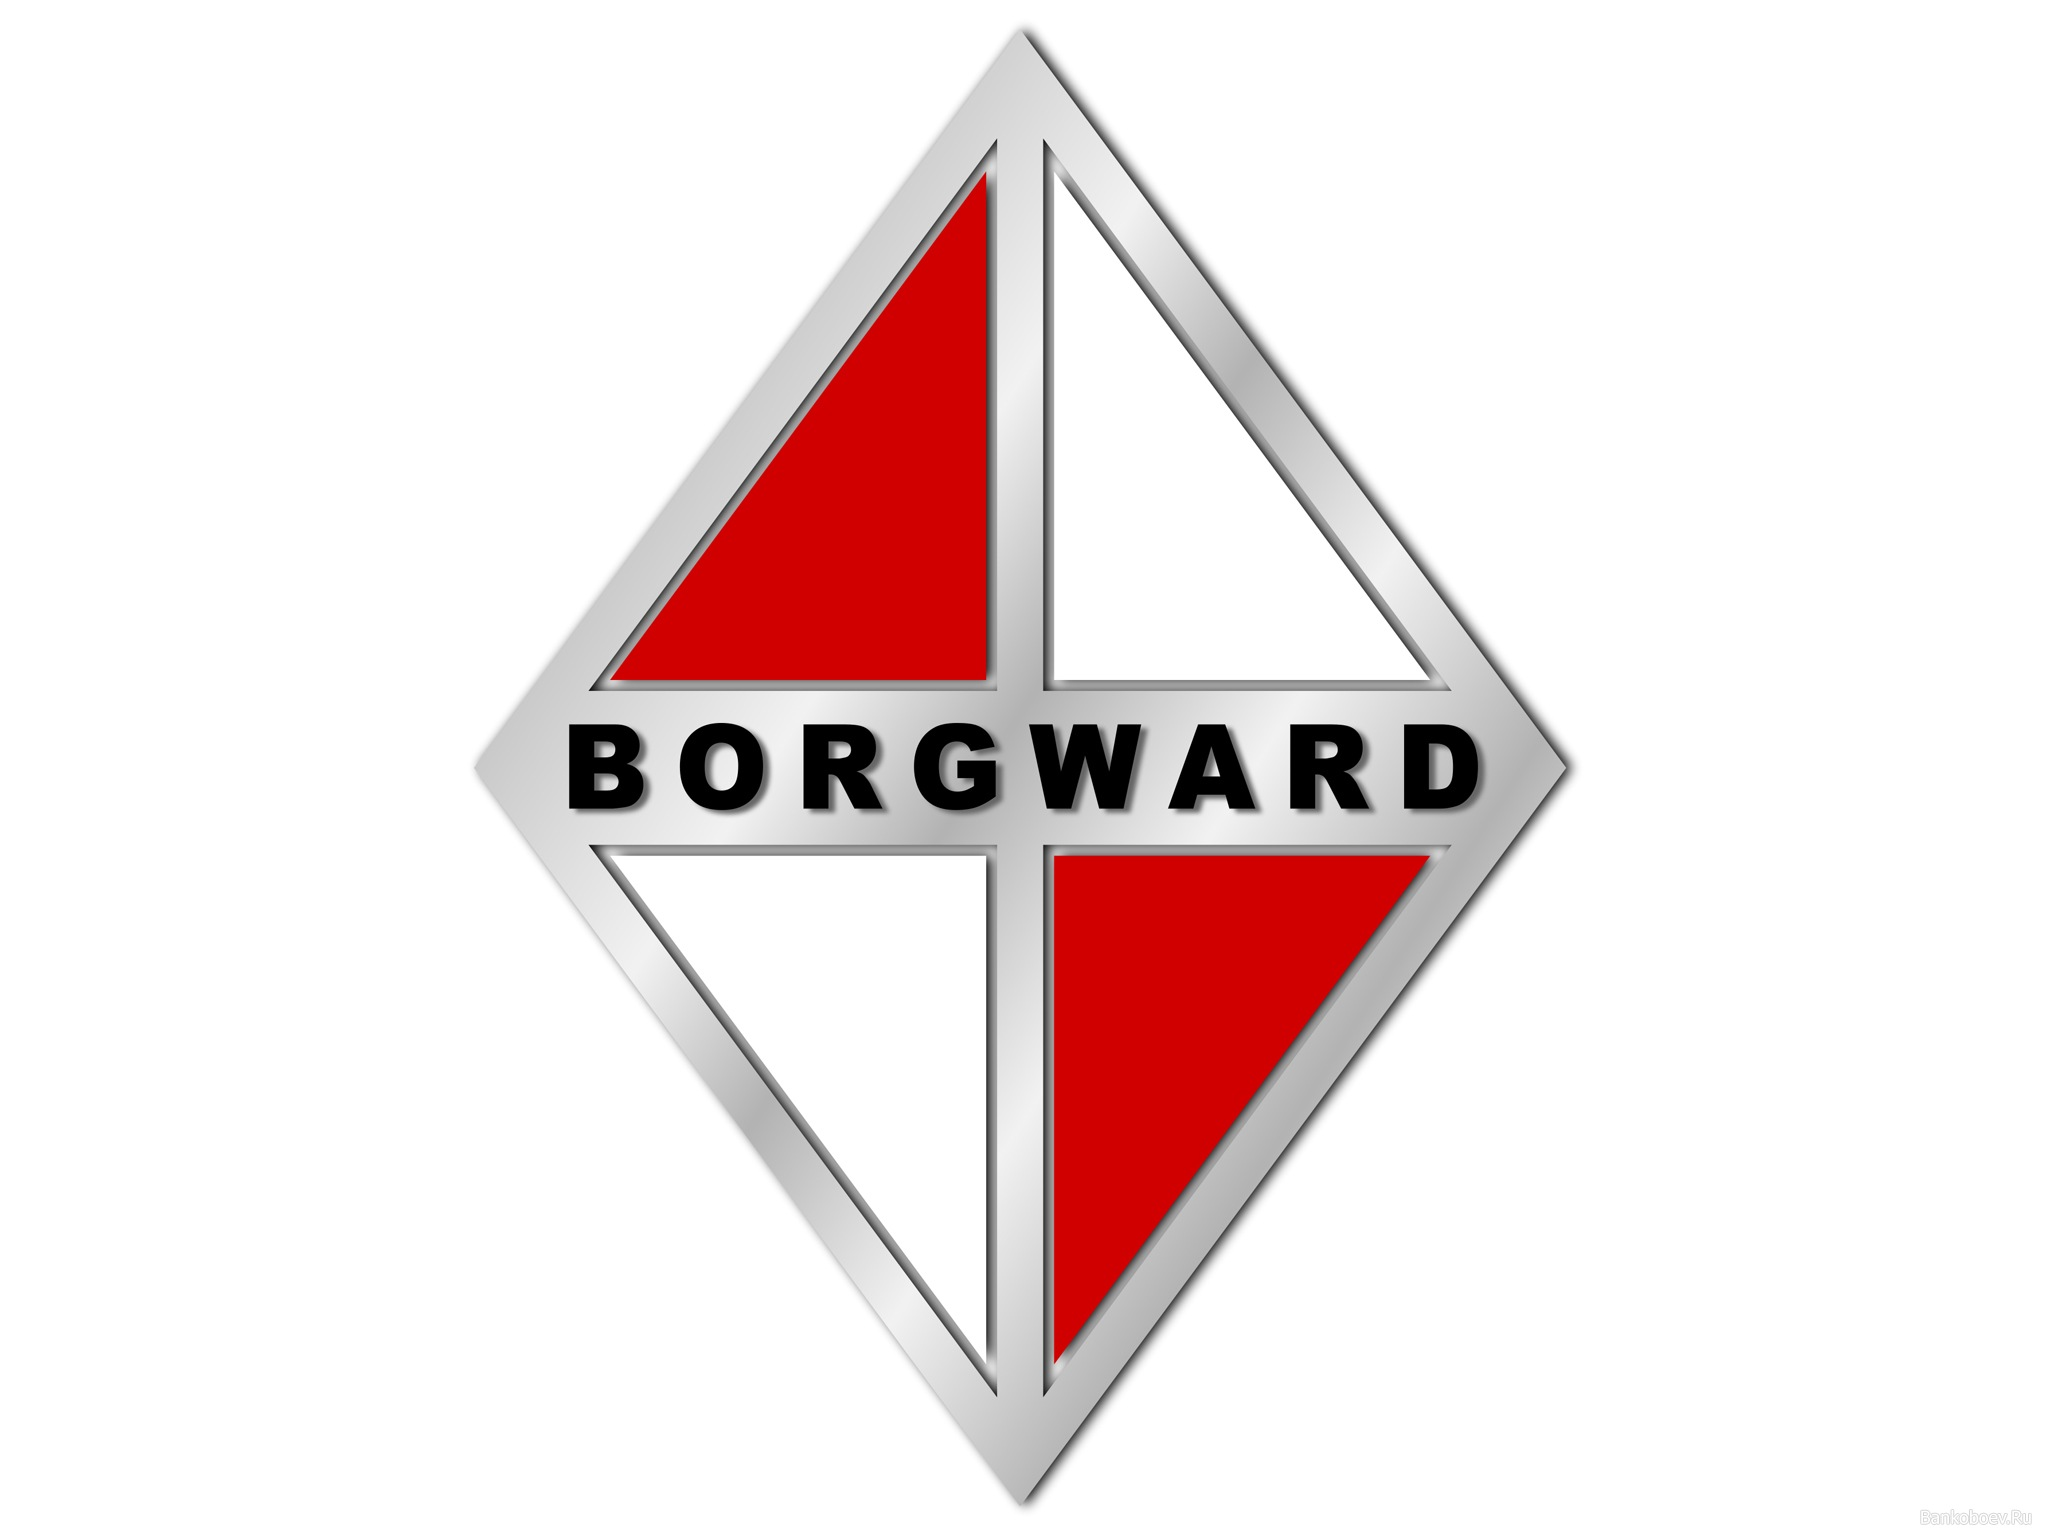 Borgward Logo Wallpaper